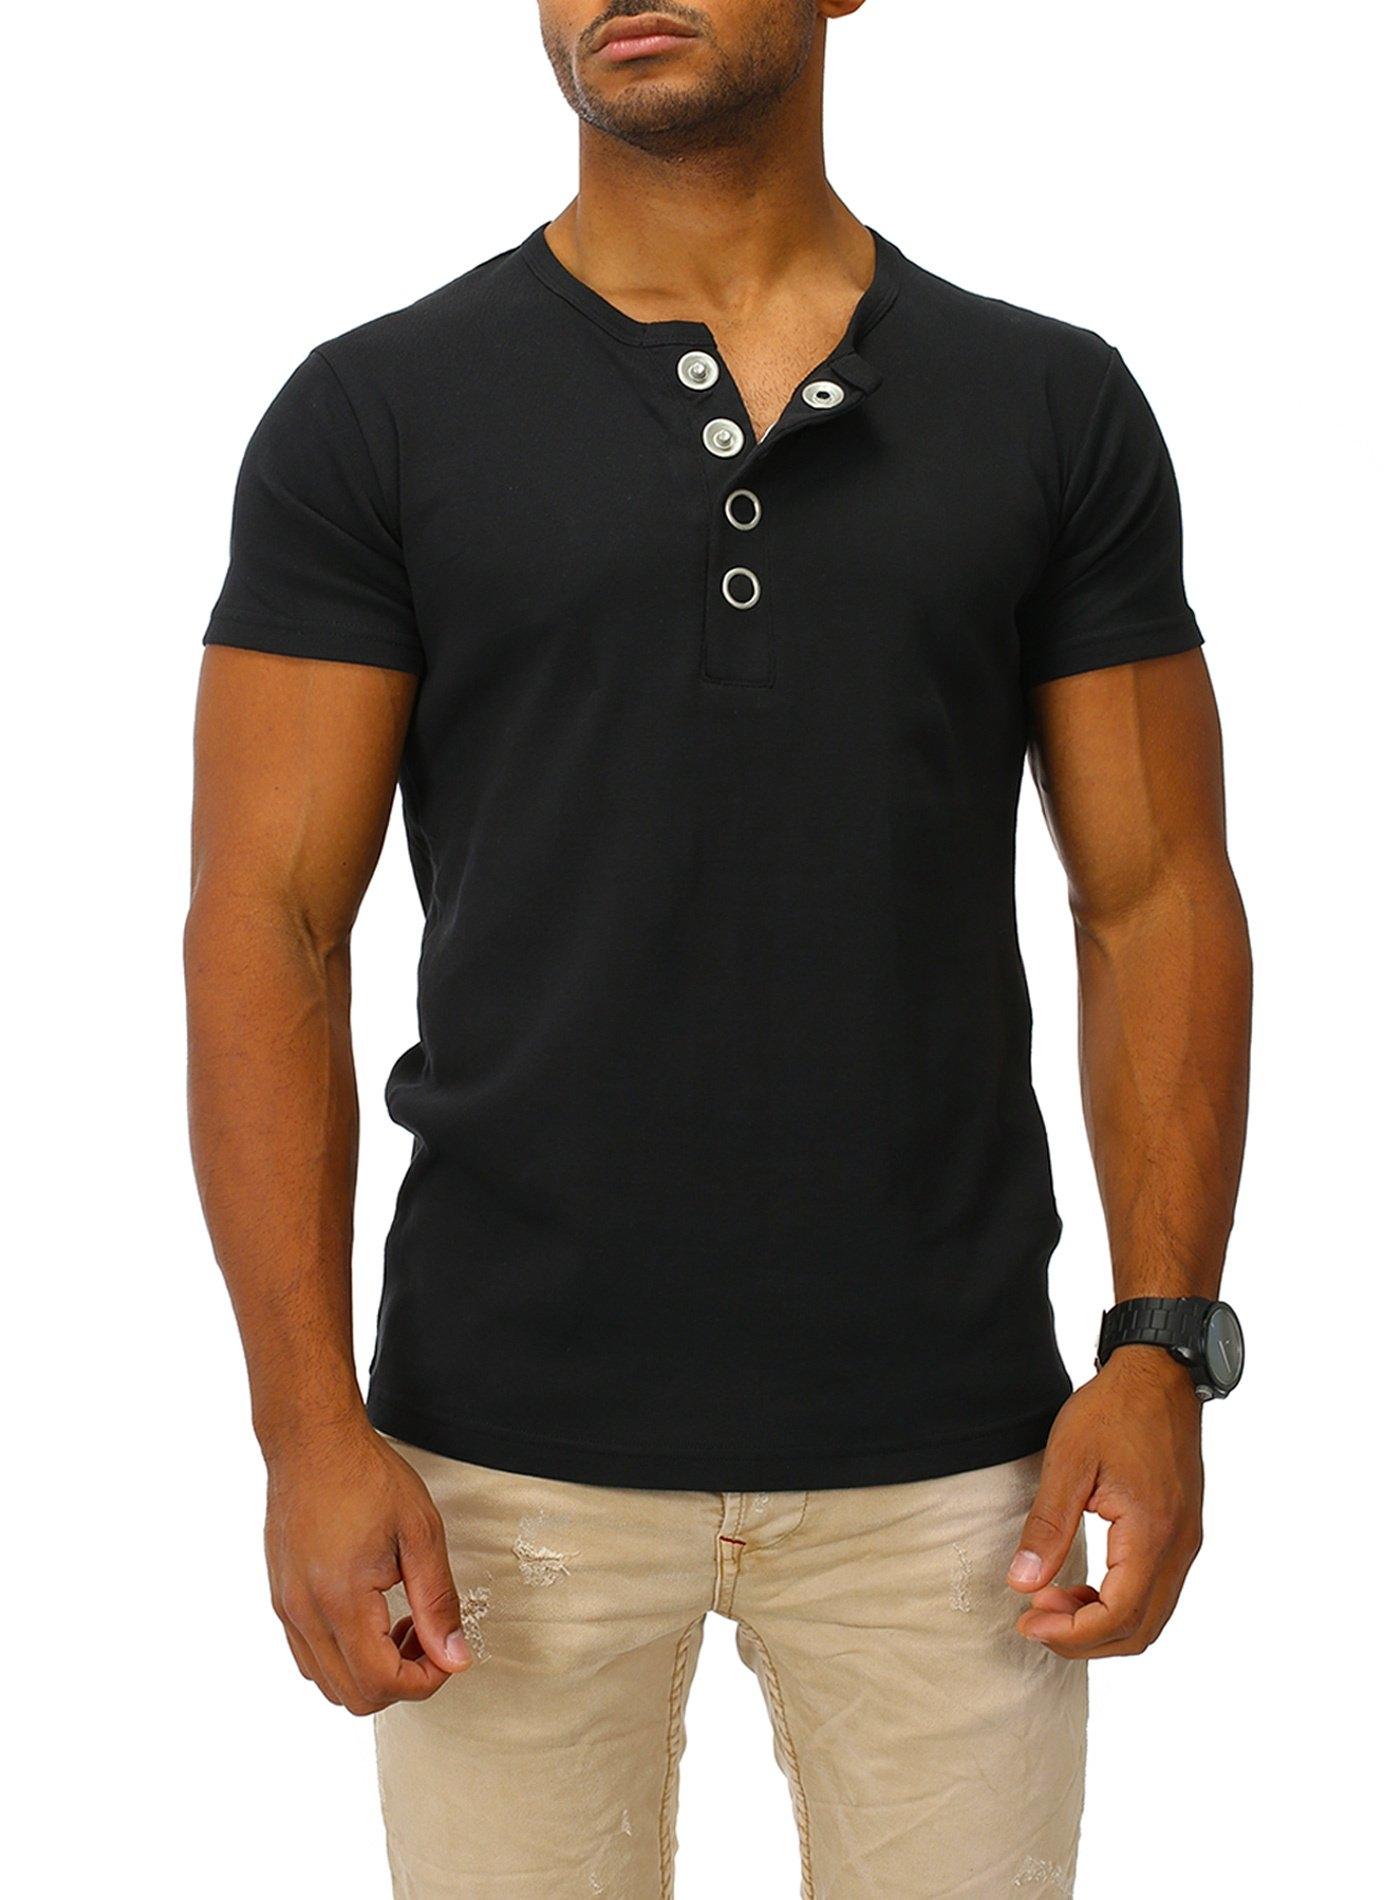 Joe Franks T-shirt »Big Button« - verschillende betaalmethodes